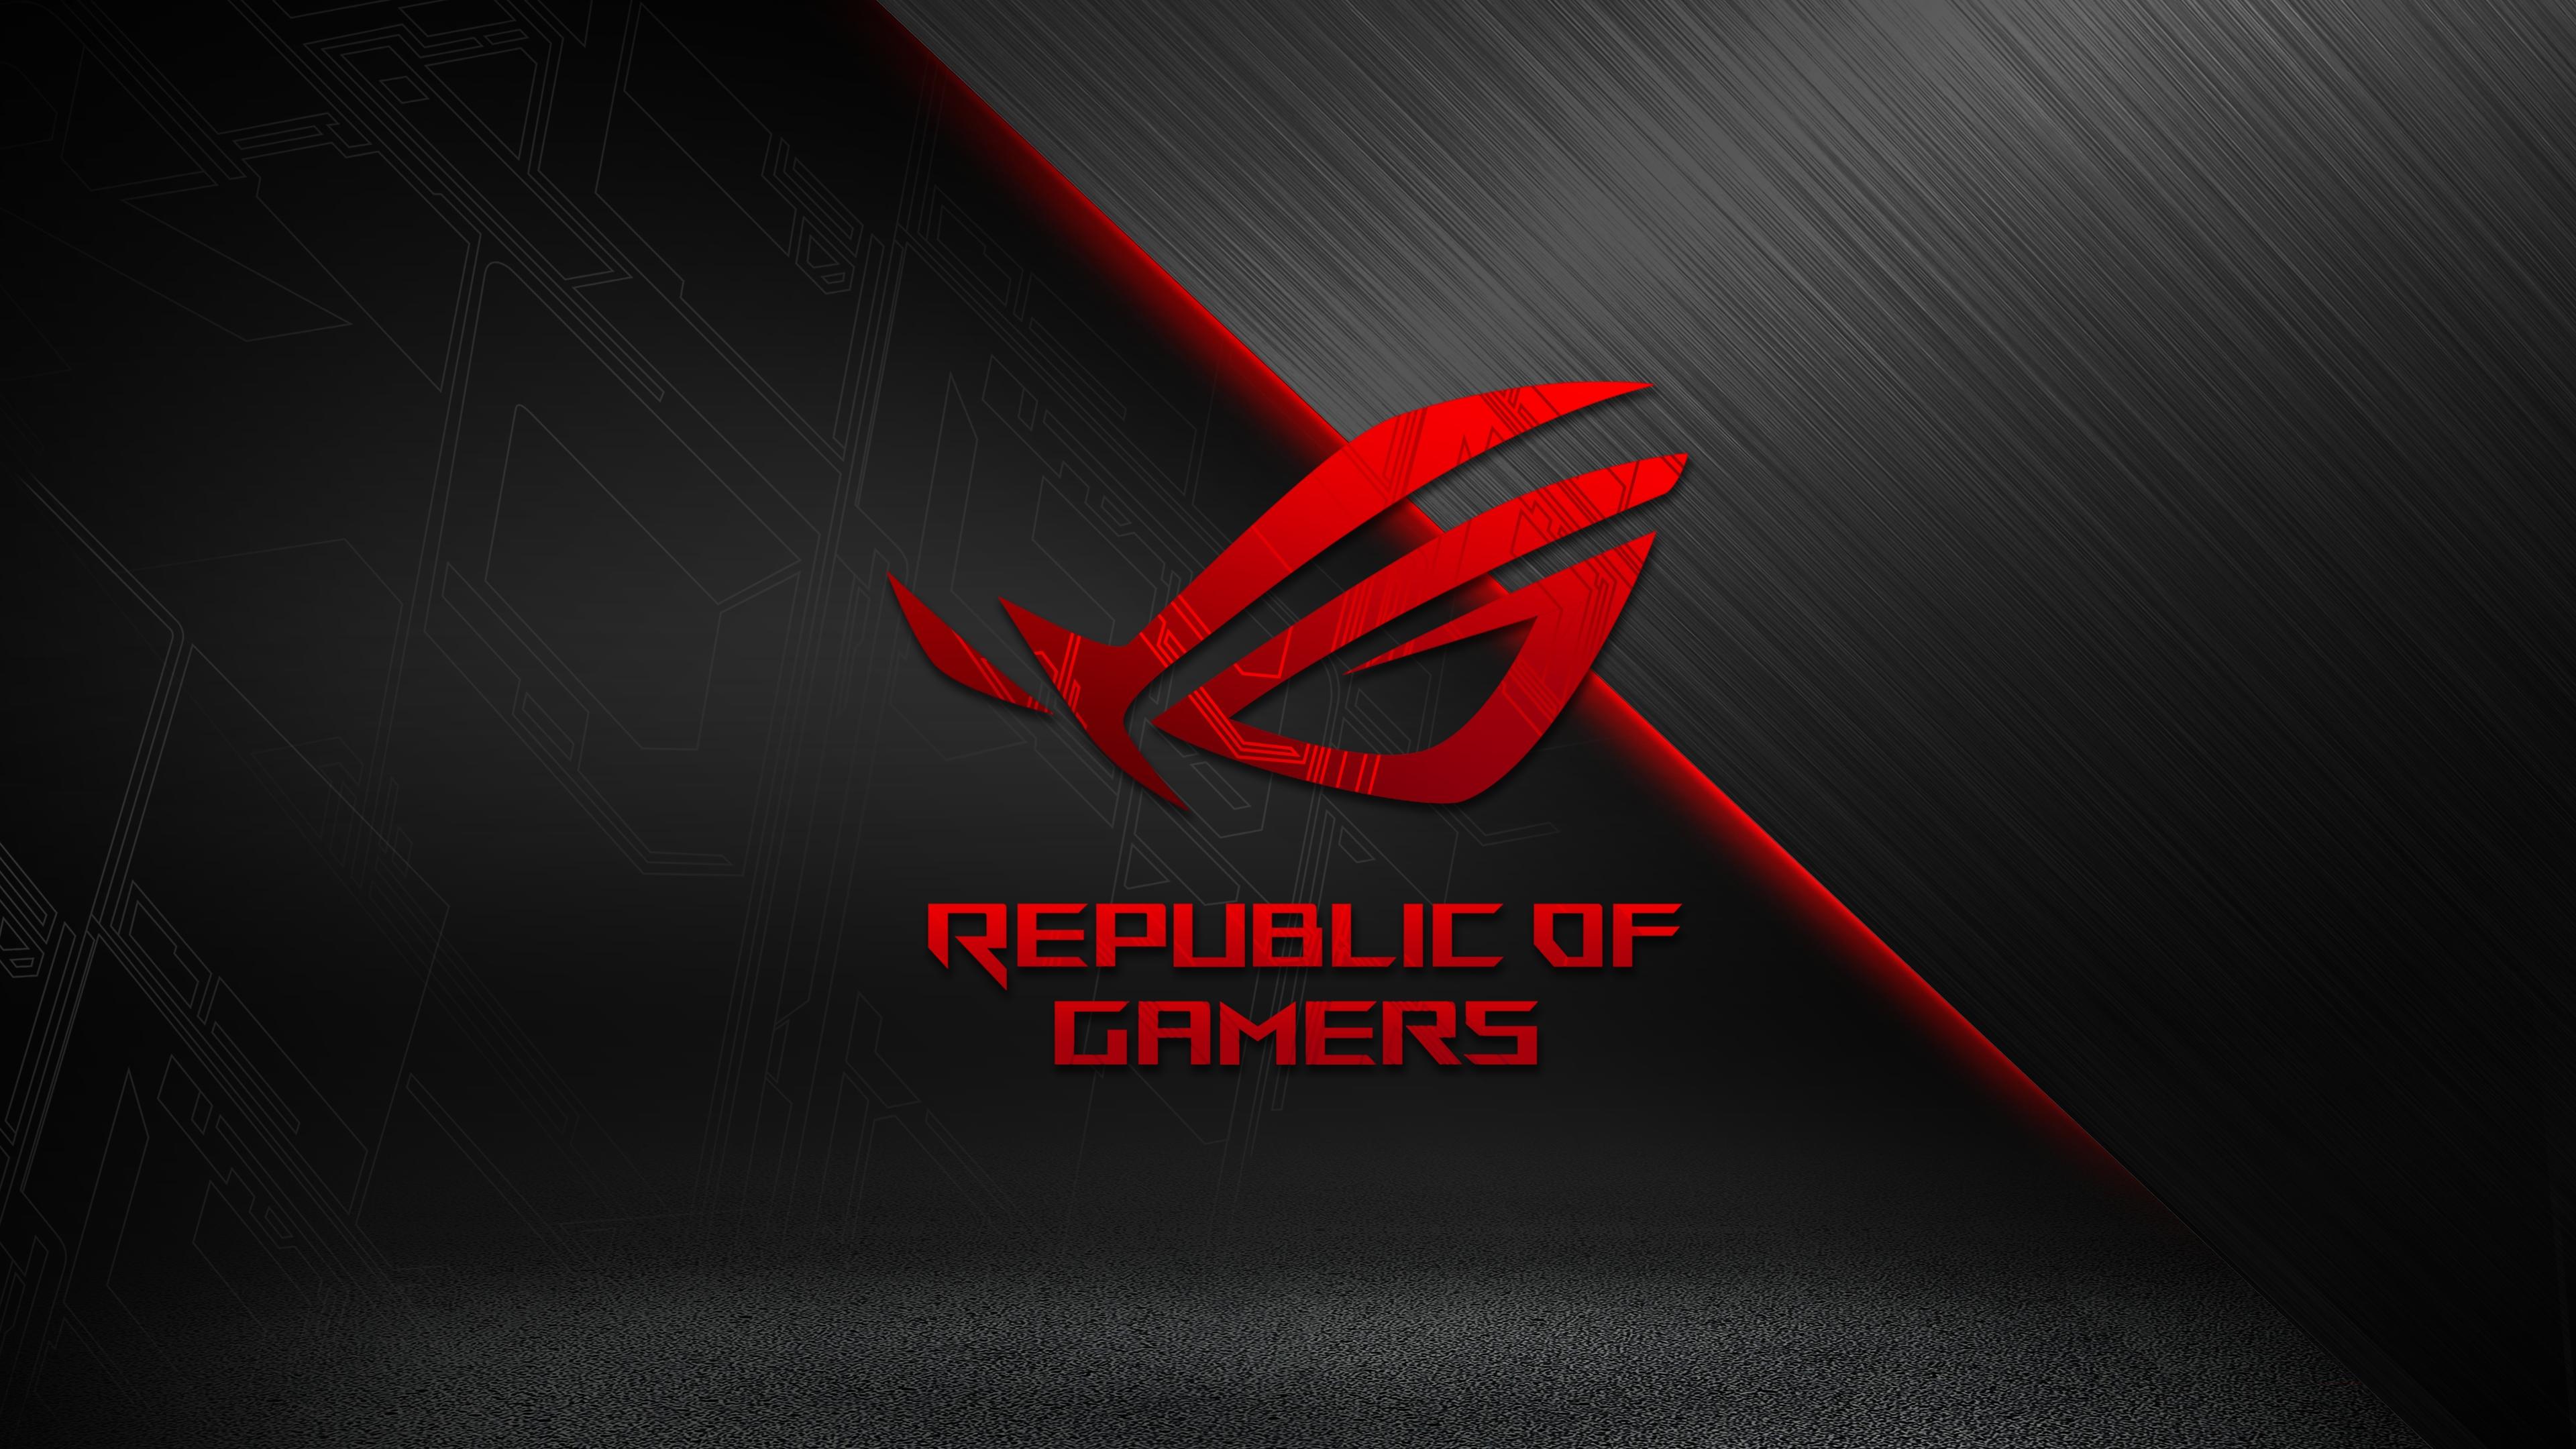 Image Details Source Jonvilma Title Games Rog Asus Republic Of Gamers Wallpapers Desktop Phone Tablet Dimension 3840 X 2160